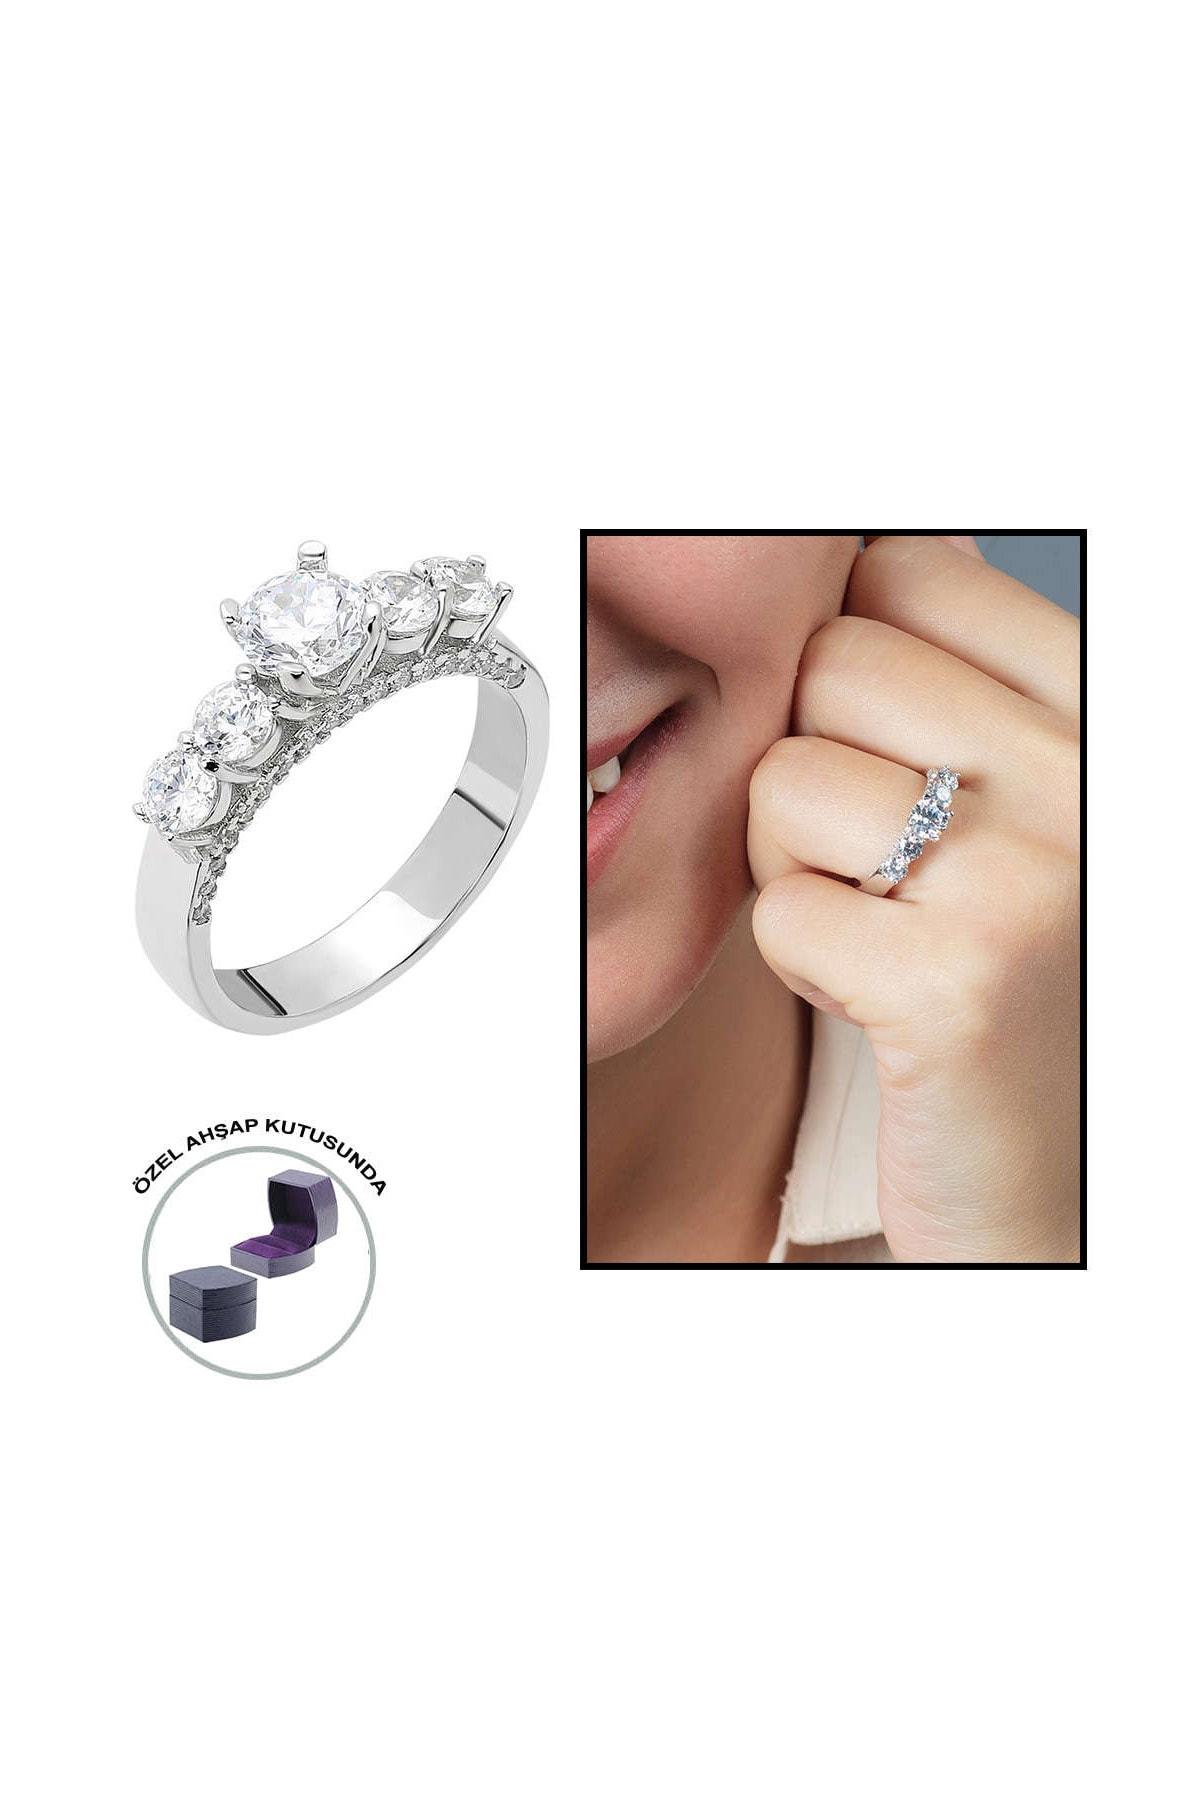 Tesbihane Starlight Diamond Pırlanta Montür Zarif Tasarım 925 Ayar Gümüş Bayan Beştaş Yüzük 102001812